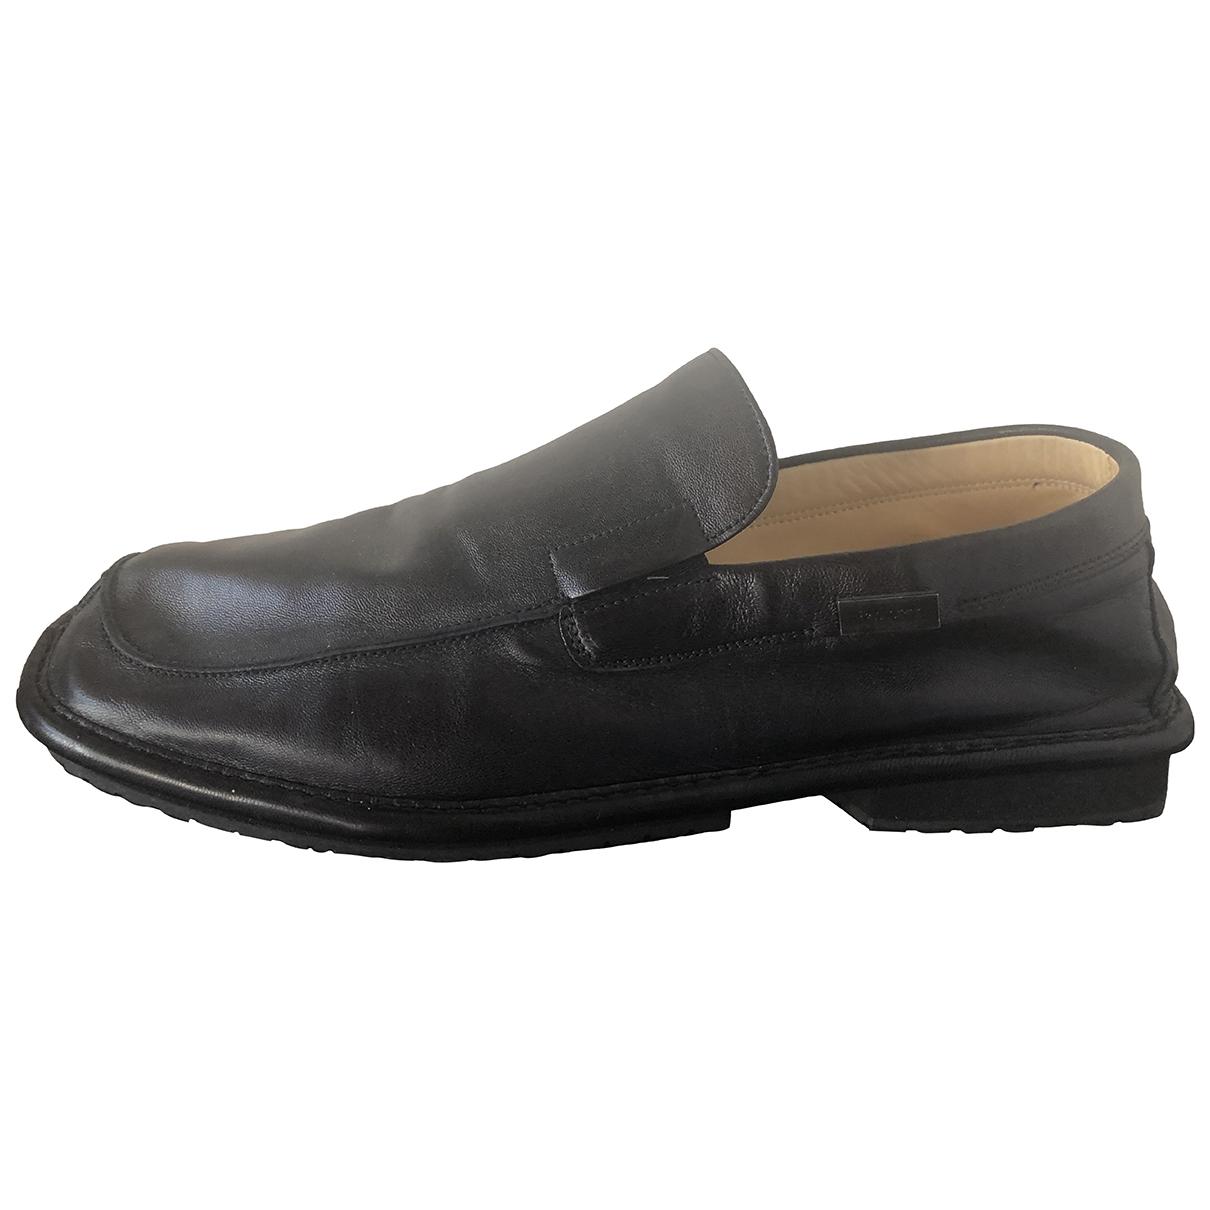 Cesare Paciotti \N Black Leather Flats for Men 8 UK